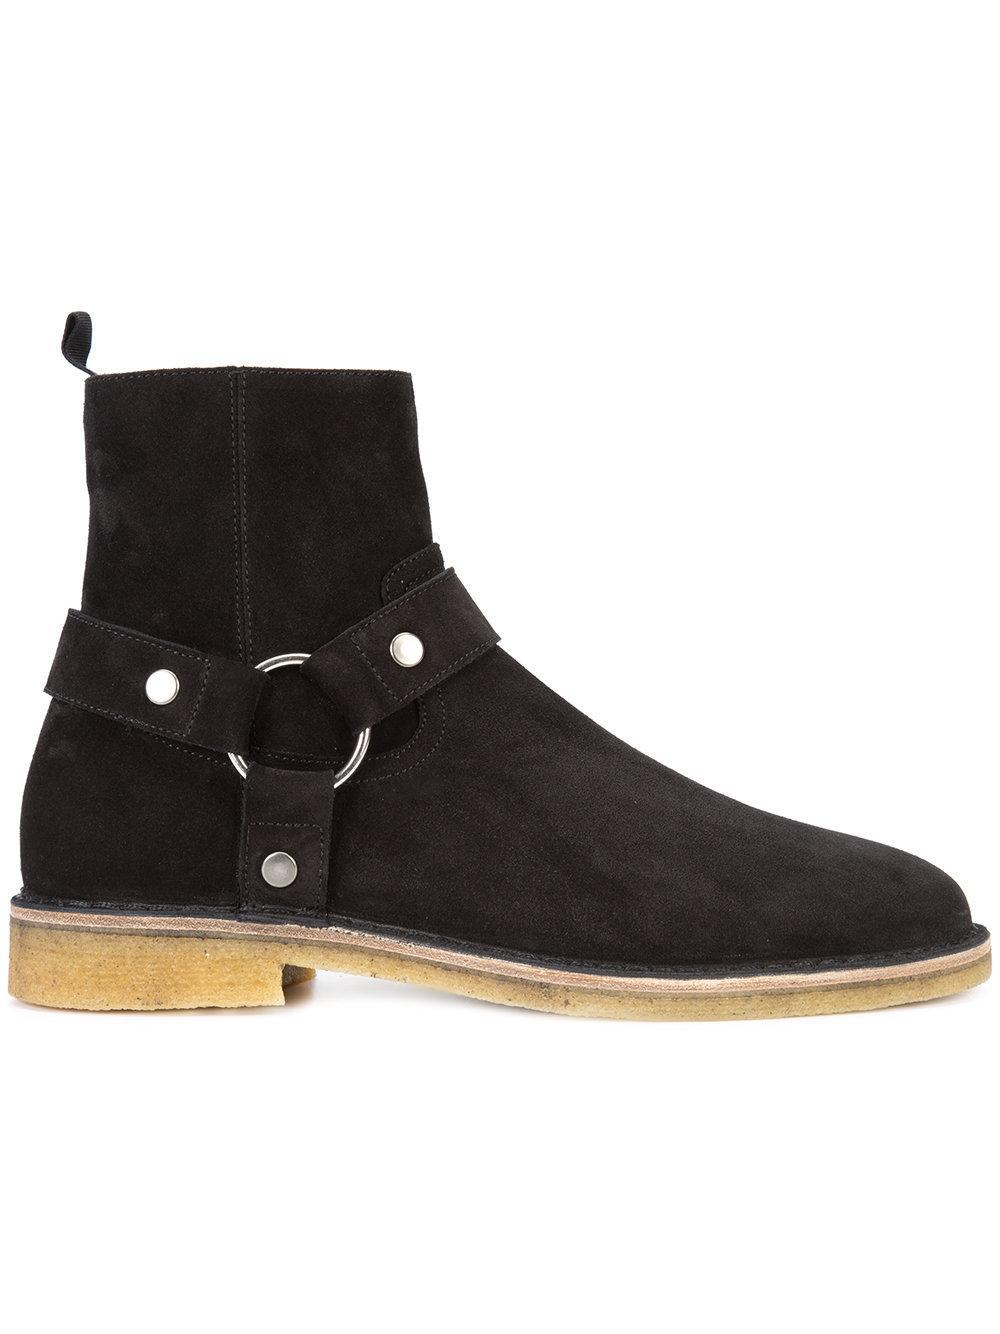 Nevada Slip On Shoes